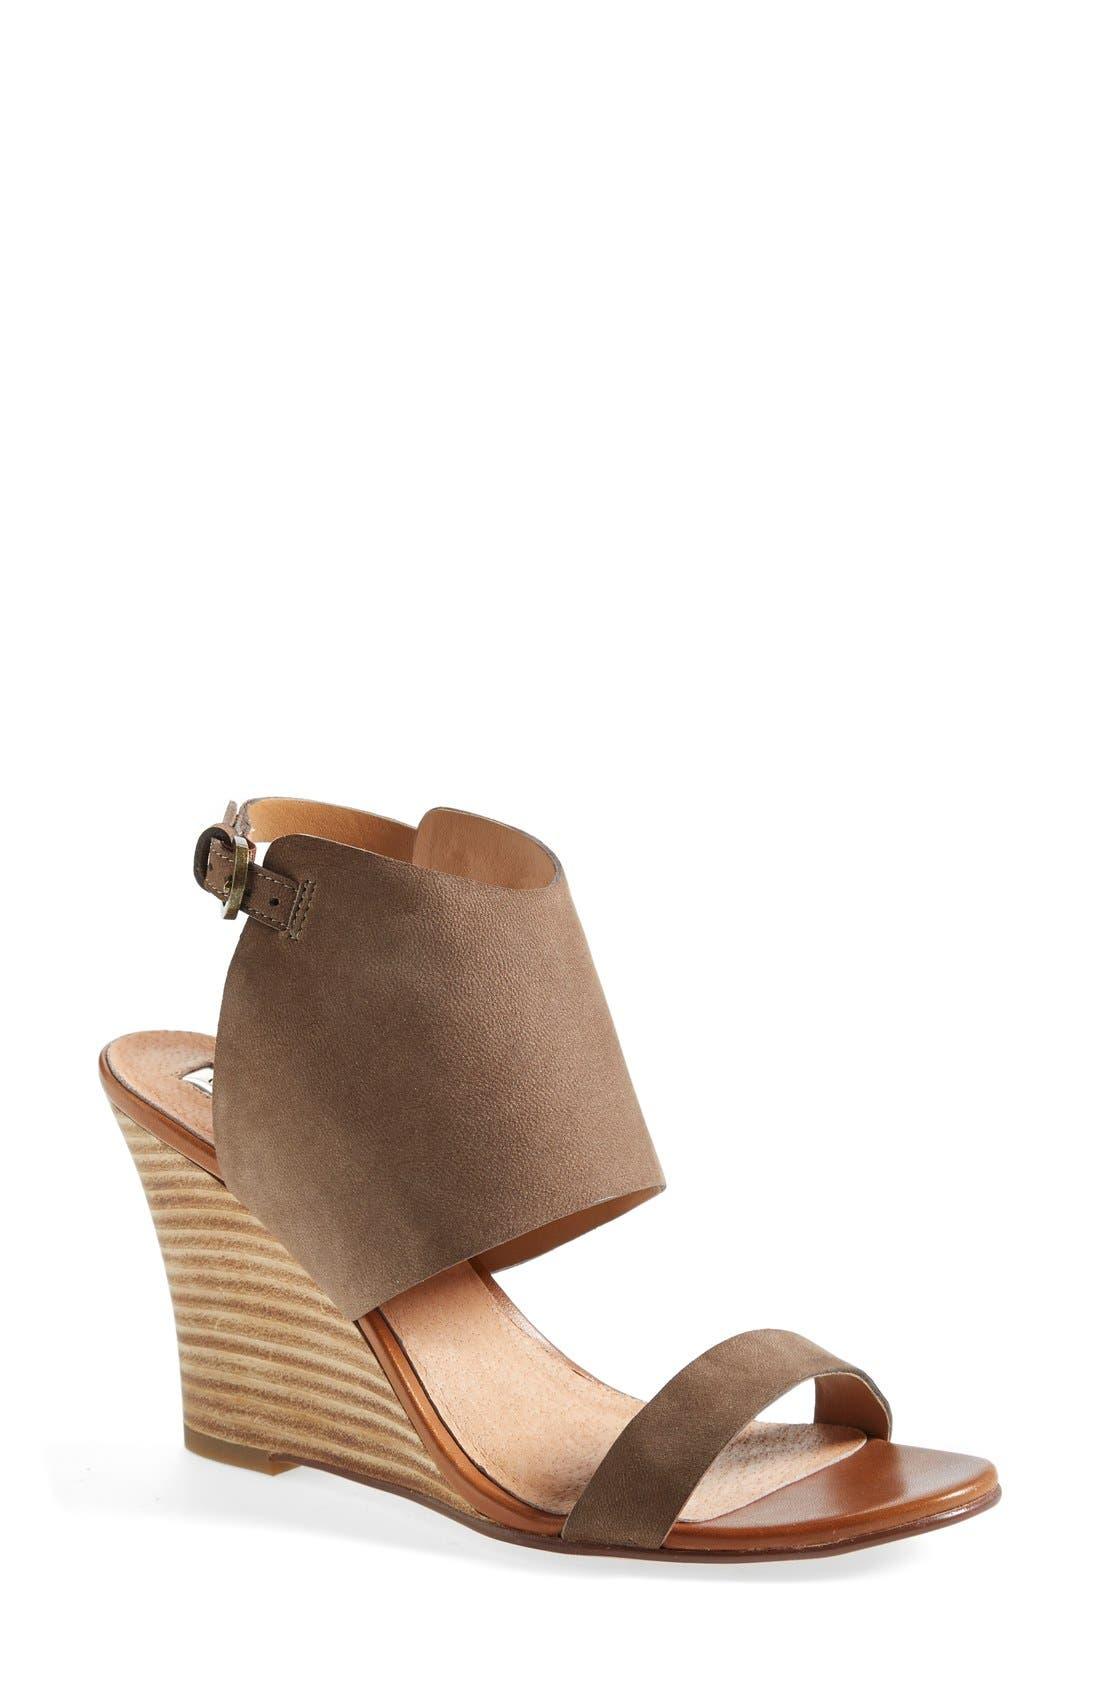 Main Image - Halogen® 'Clarette' Wedge Sandal (Women)